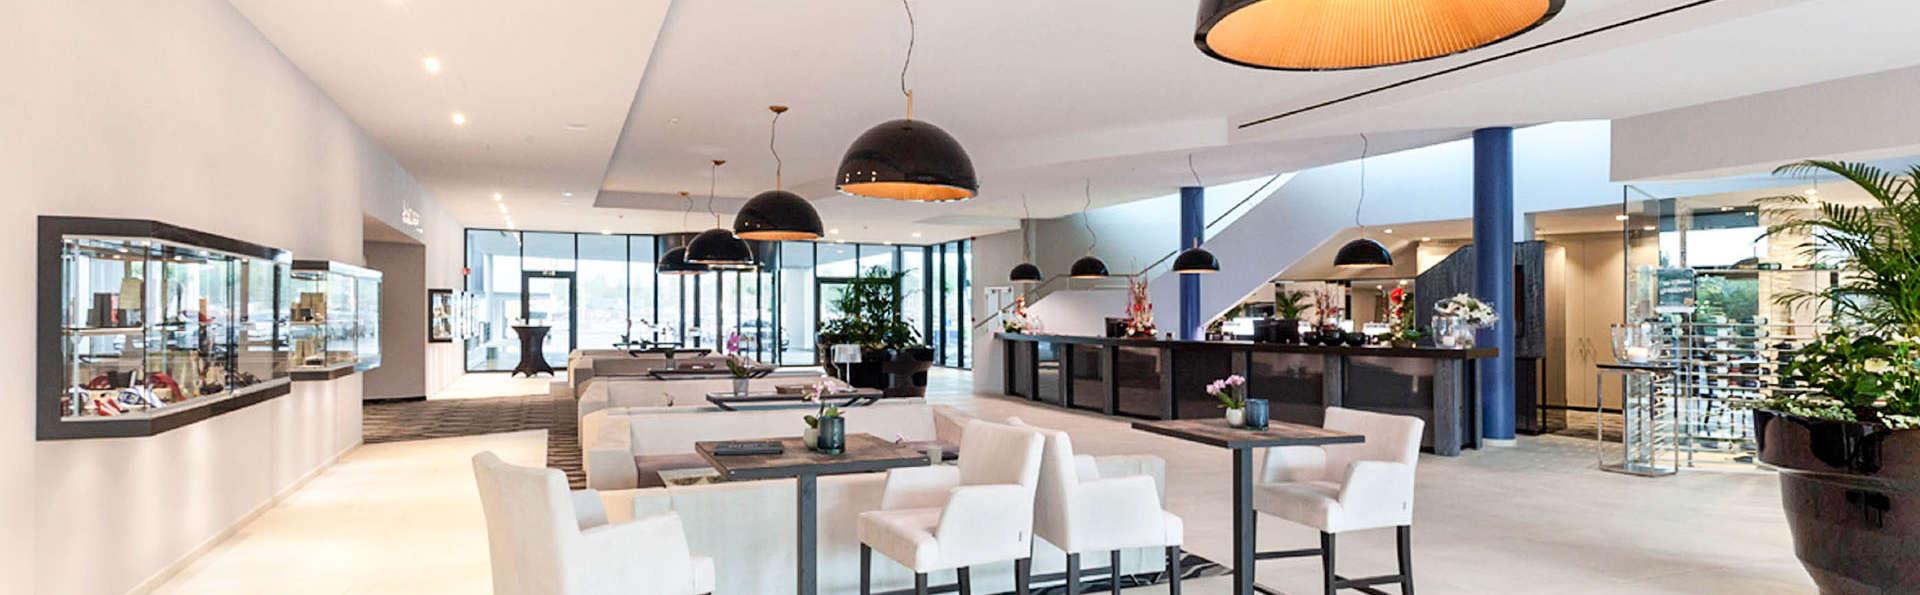 Van der Valk Hotel Mons Congres - EDIT_LOUNGE_01.jpg